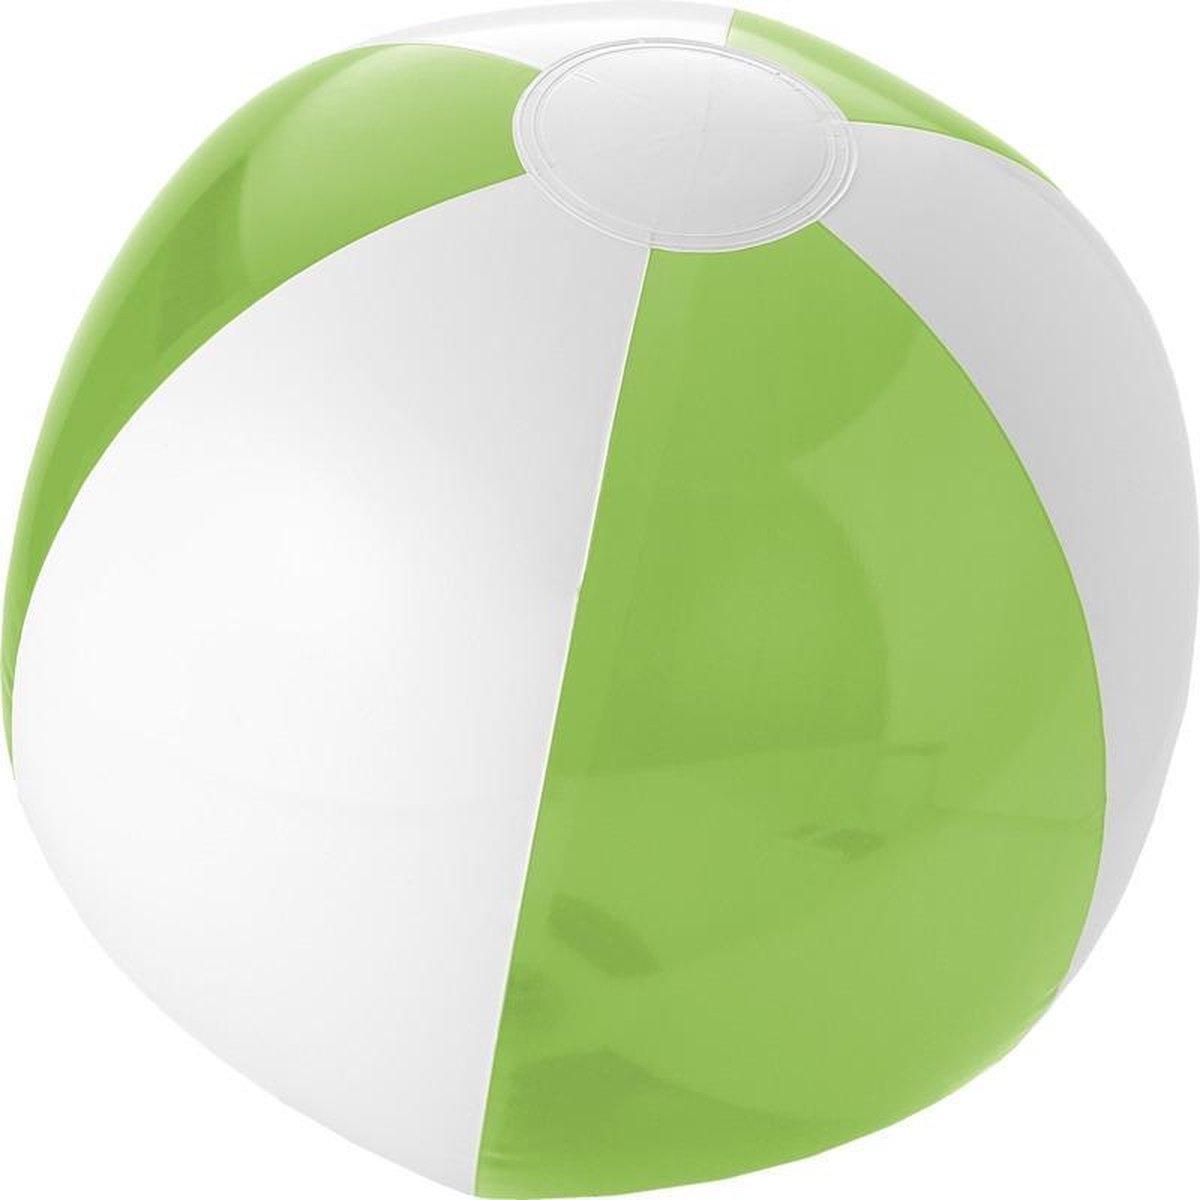 1x Opblaasbare strandballen groen/wit 30 cm - Buitenspeelgoed waterspeelgoed opblaasbaar